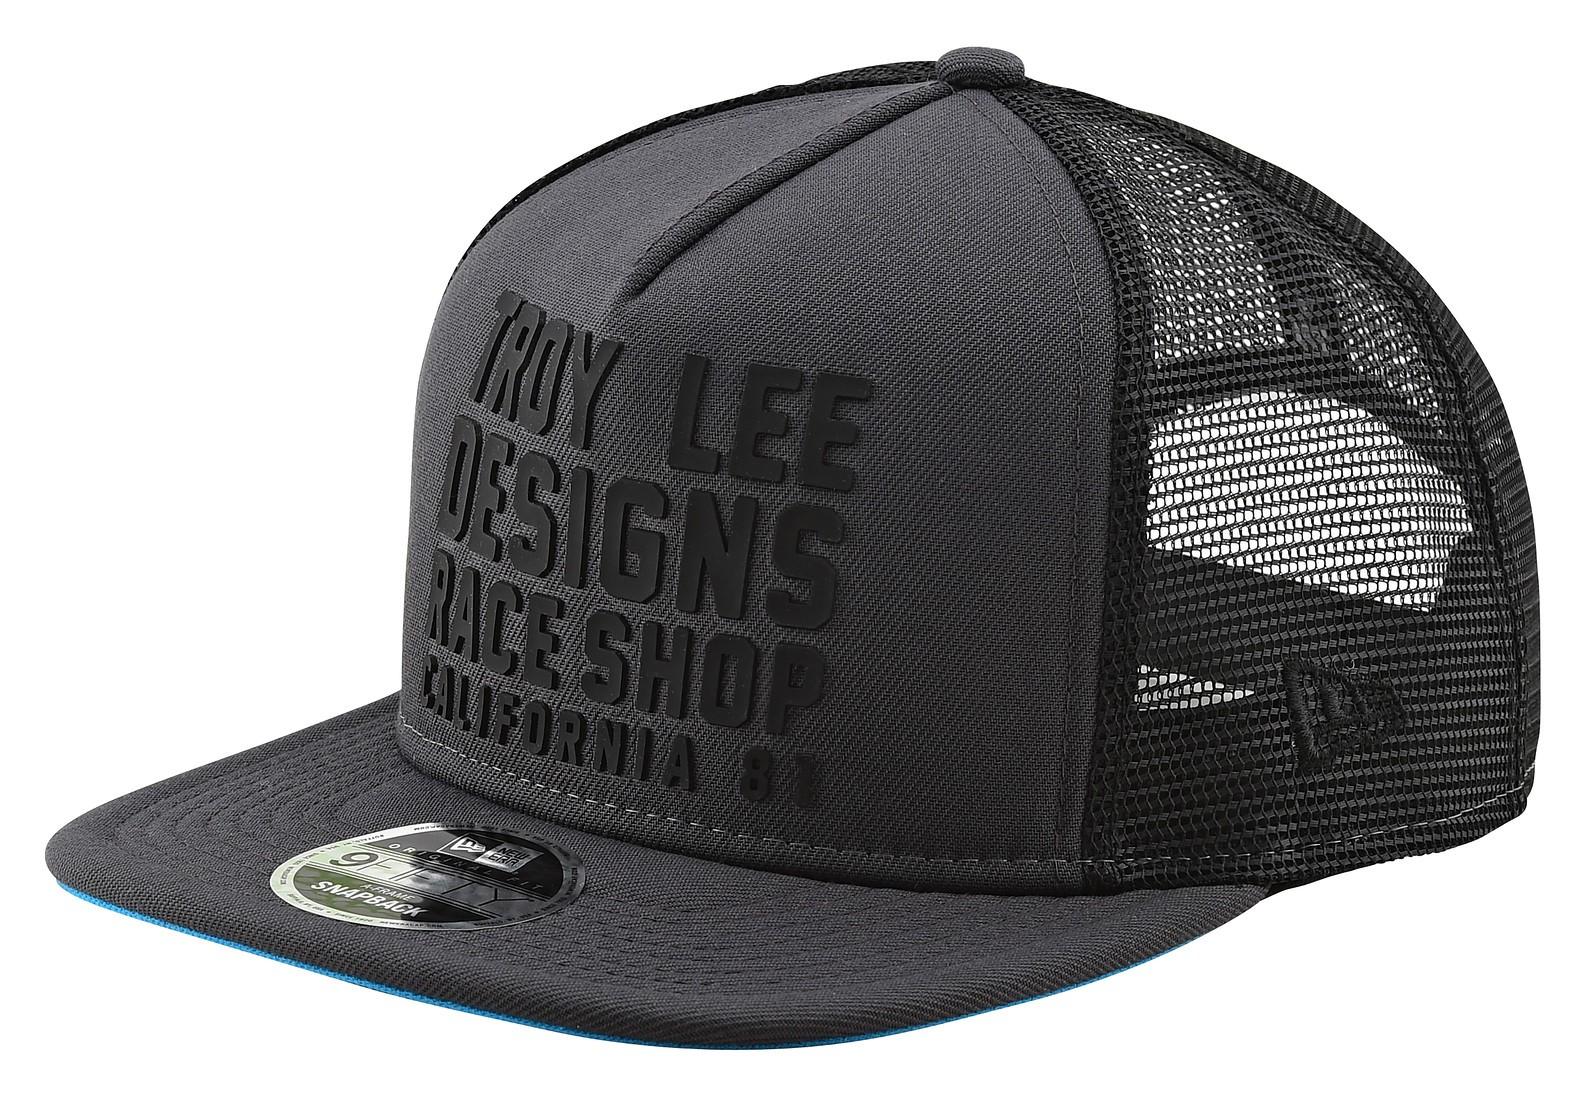 5db23f4a7e7cf Troy Lee RC Cali Snapback Hat - RevZilla